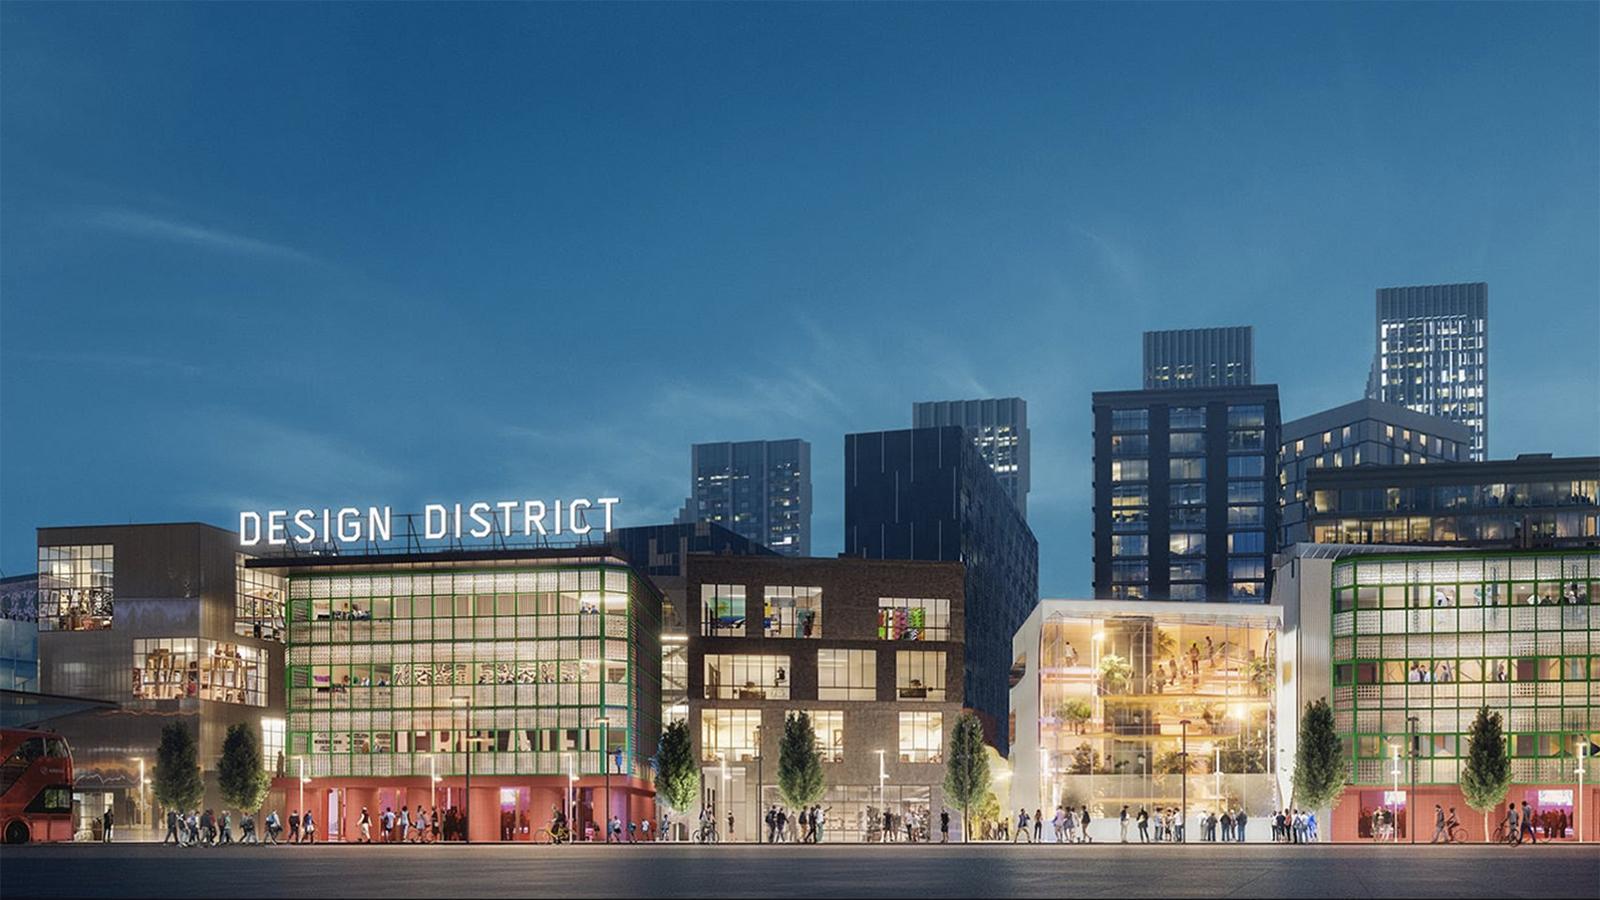 London design district